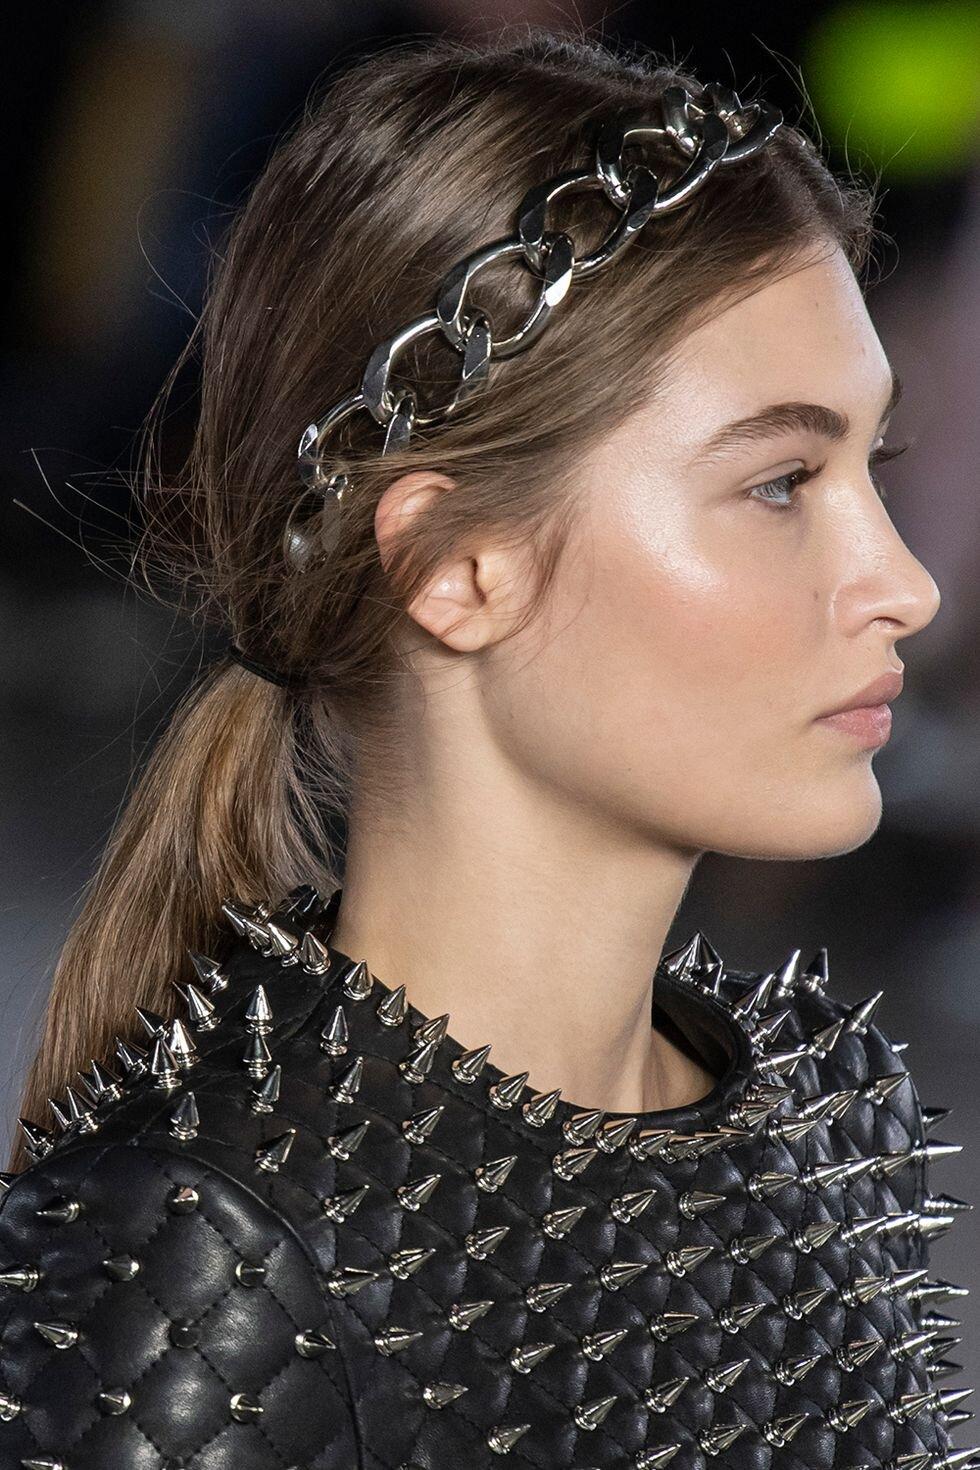 autumnwinter-2019-hair-trends-headbands-balmain-imaxtree-1552562804.jpg